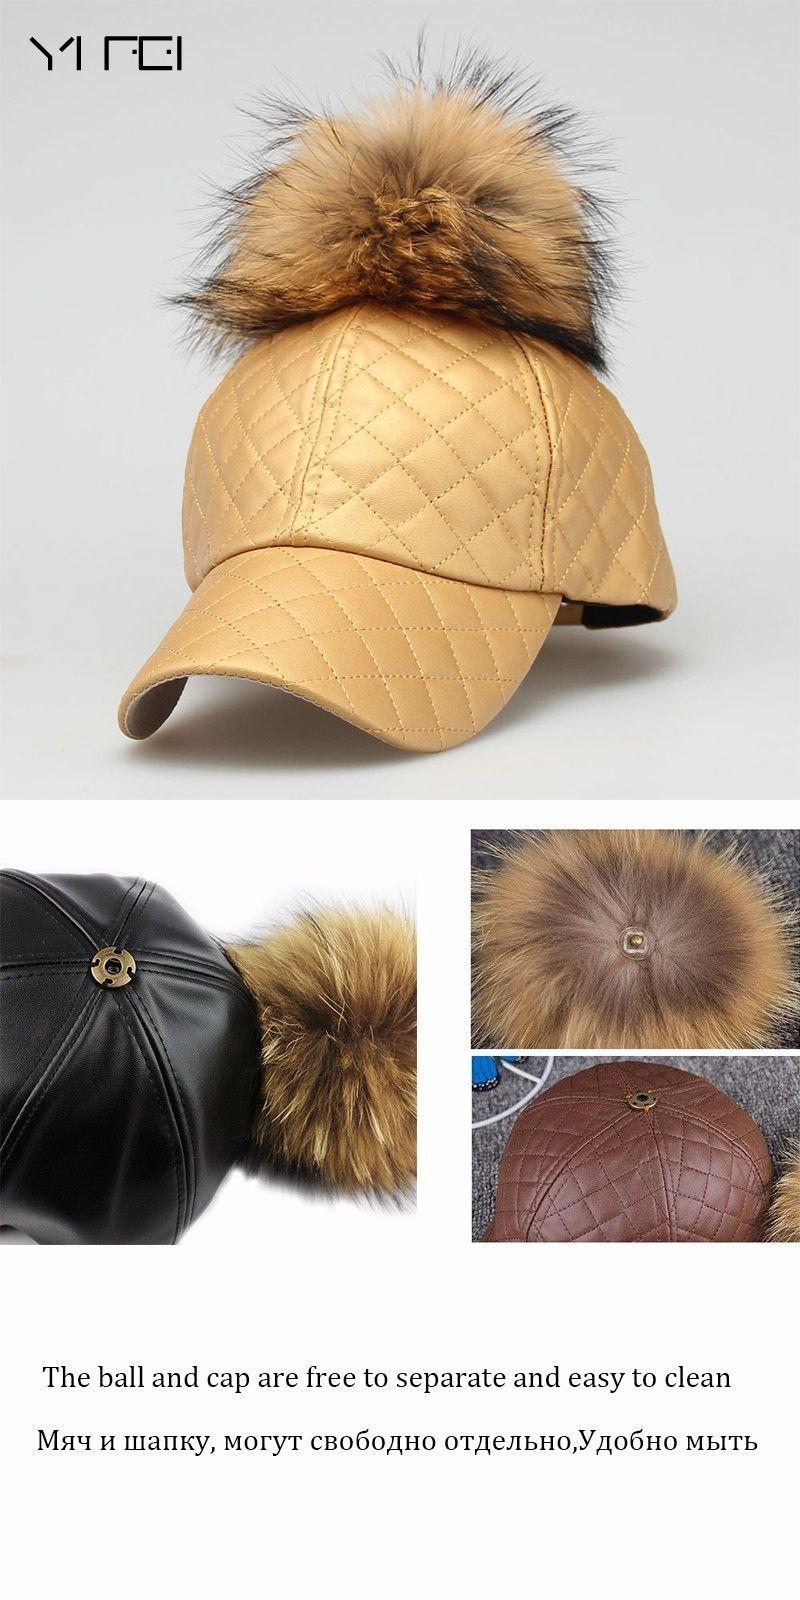 e309b314459 YIFEI 2017 NEW AUTUMN Female Warm PU Leather Baseball Cap 15CM Real Raccoon  Fur Pompoms Hats